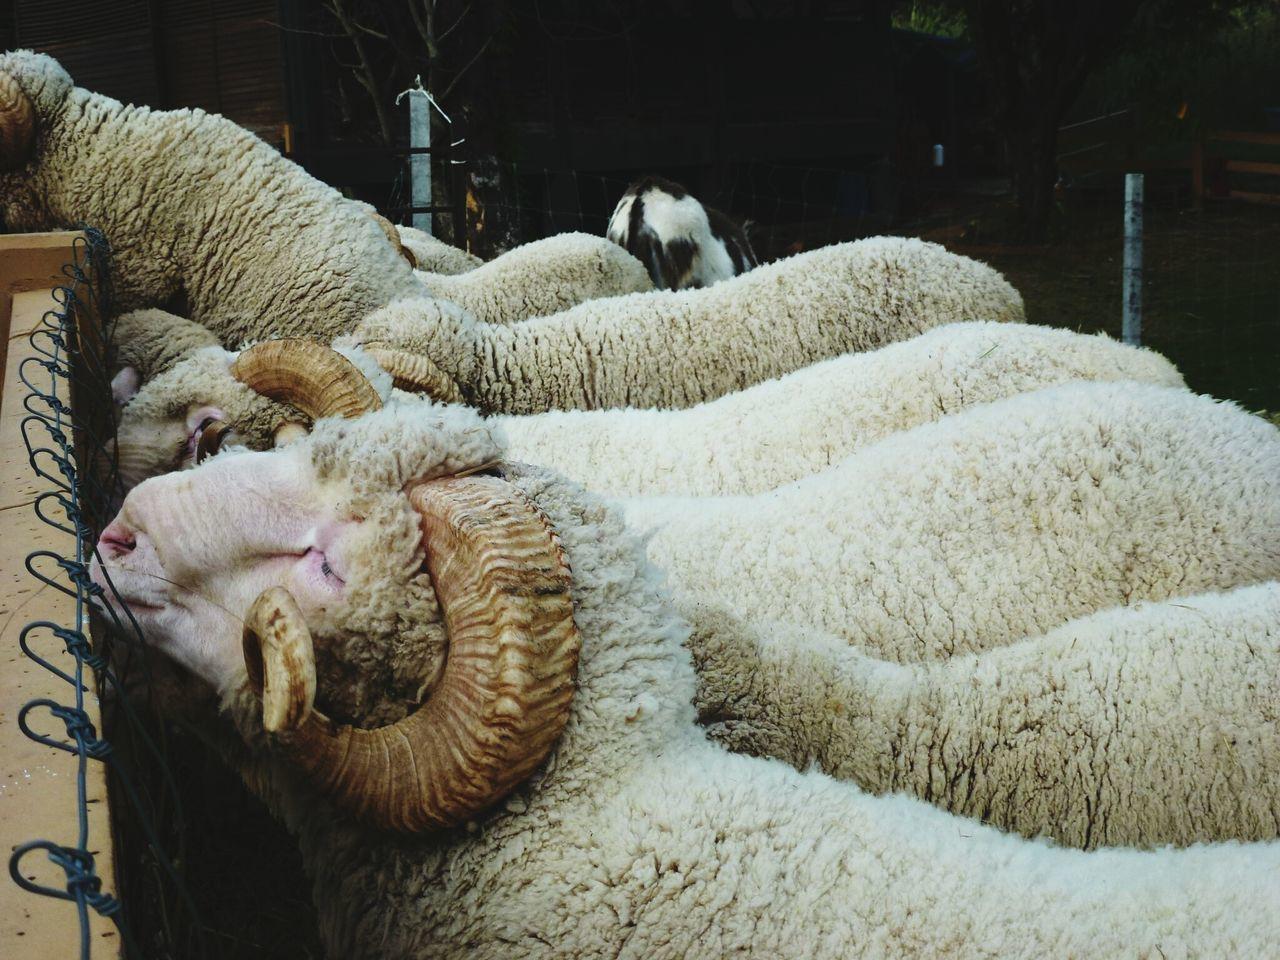 Sheep Farm Domestic Animals Animal Themes Nature Sheep Sheep Wool Woolen Yarn EyeEmNewHere Adapted To The City